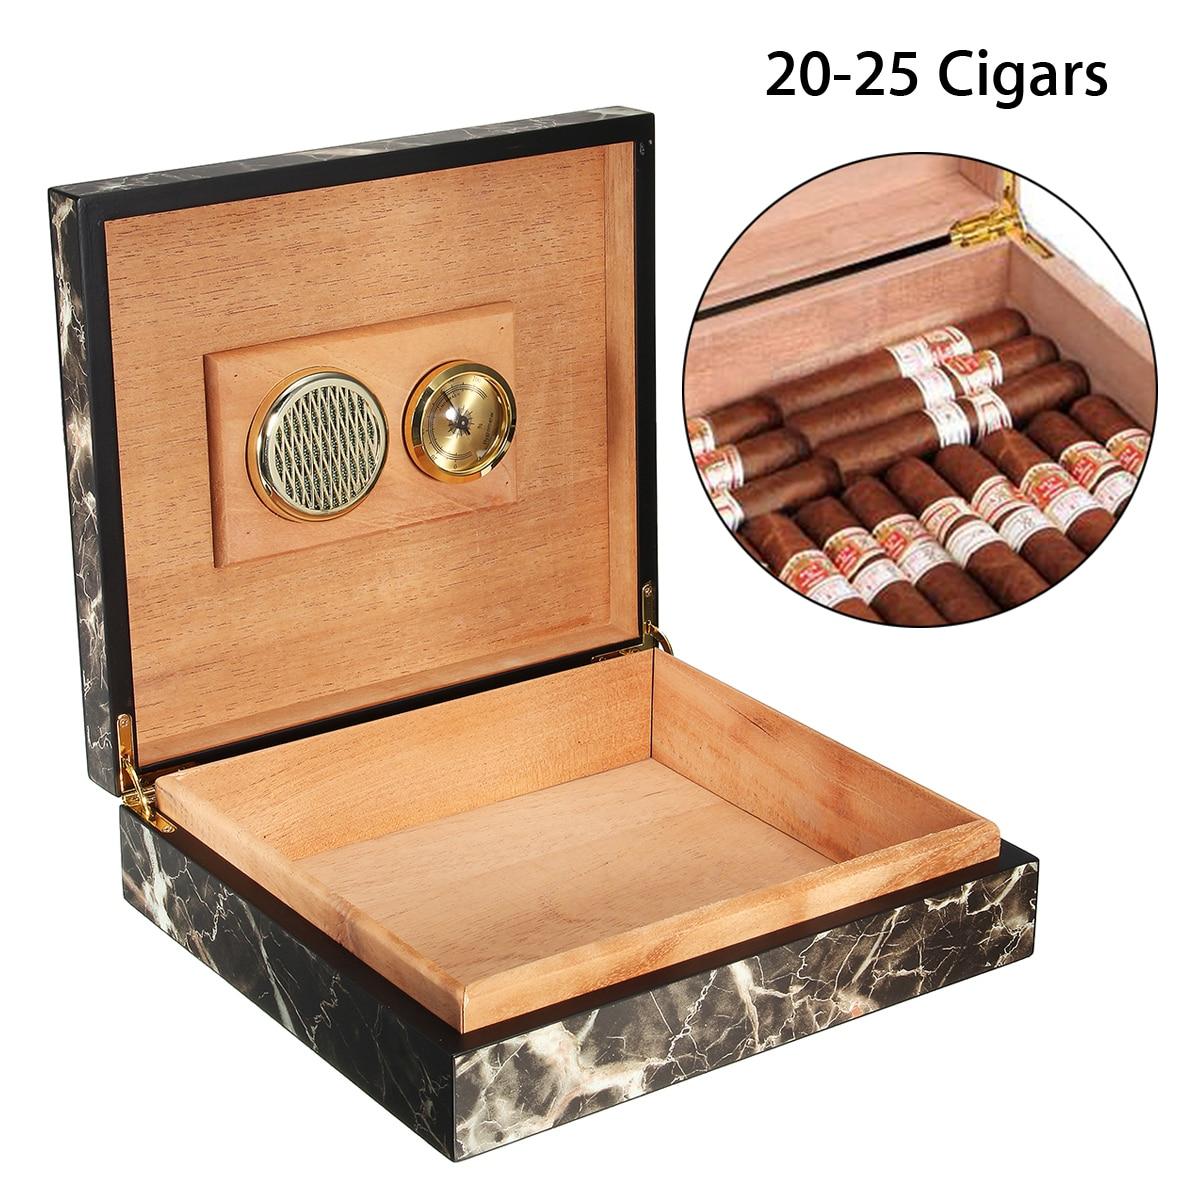 YKPuii Portable Cedar Wood Cigar Case Wooden Cigar Storage Box with Humidor Humidifier Moisturizing Device Cigar Accessories